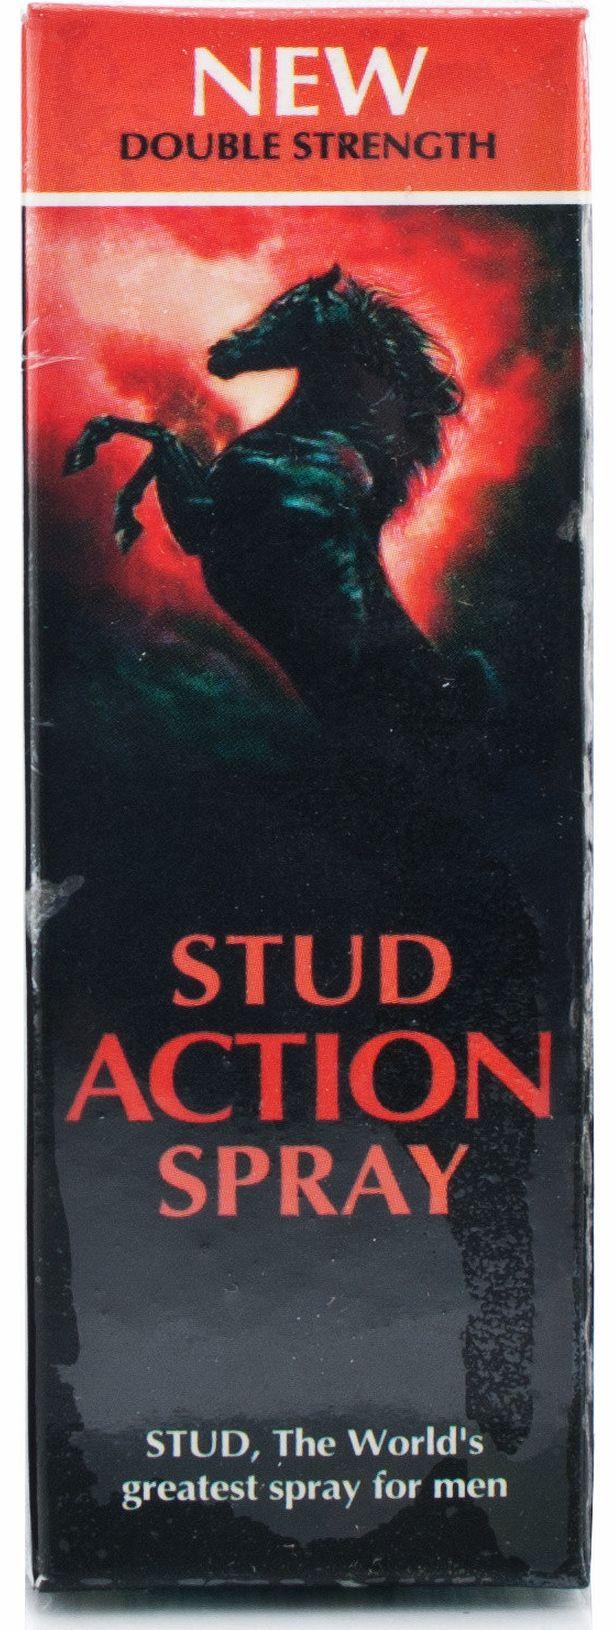 action stud